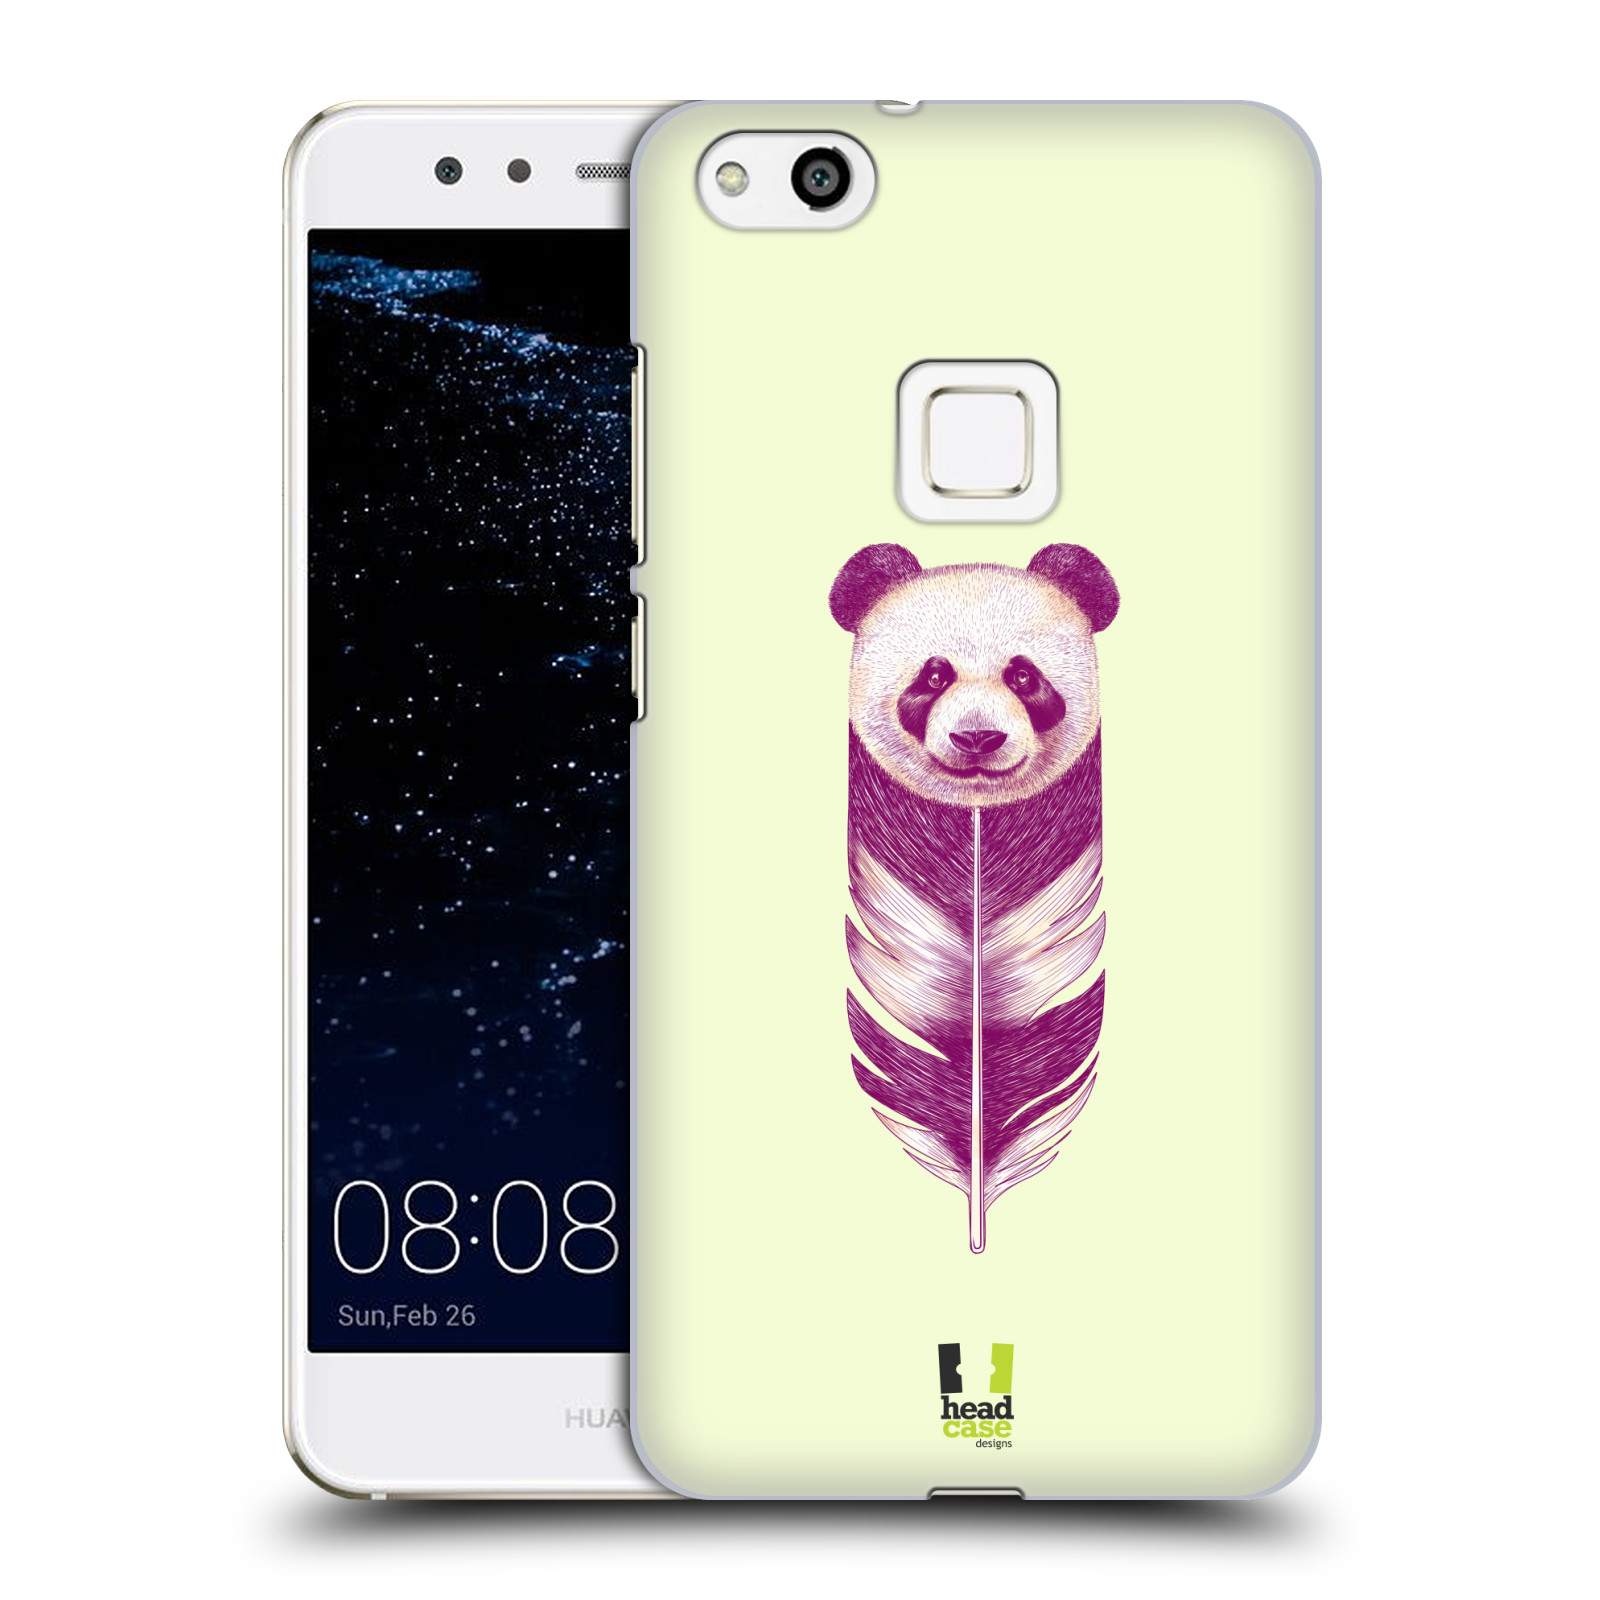 Plastové pouzdro na mobil Huawei P10 Lite Head Case - PÍRKO PANDA (Plastový kryt či obal na mobilní telefon Huawei P10 Lite Dual SIM (LX1/LX1A))